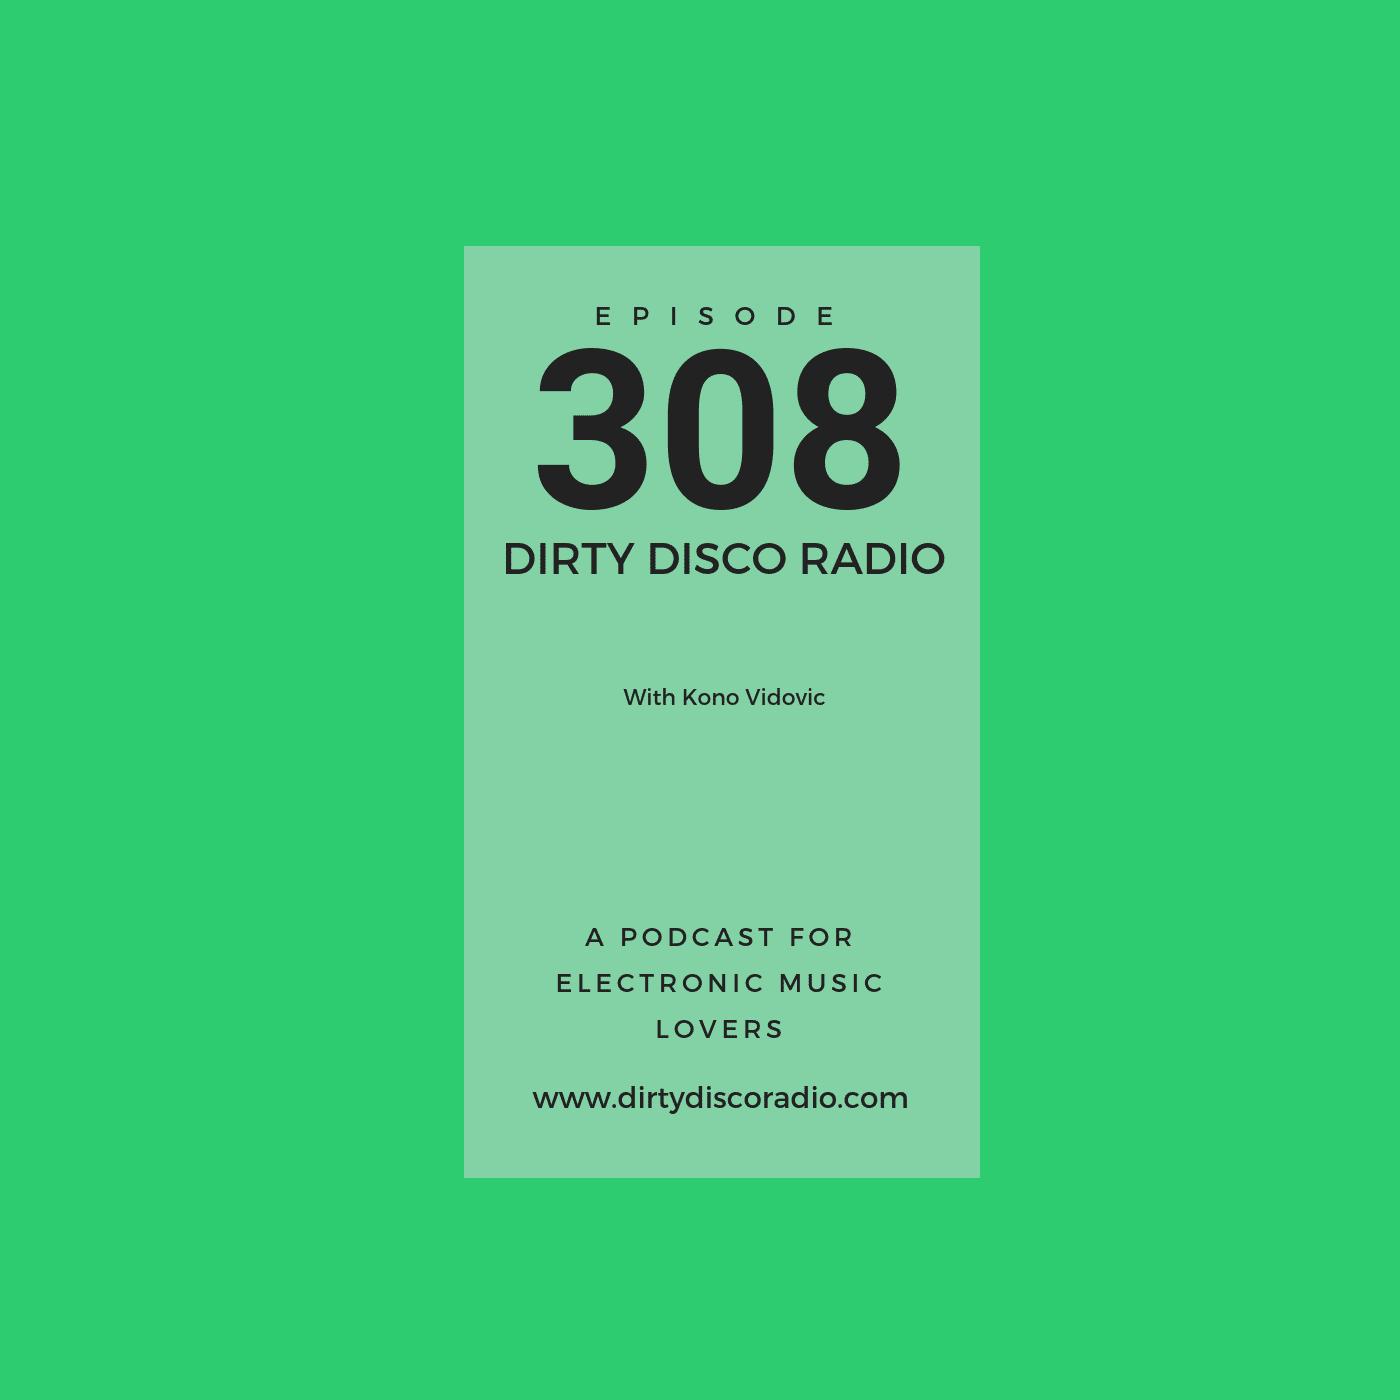 Unalloyed Pleasure - Dirty Disco 308